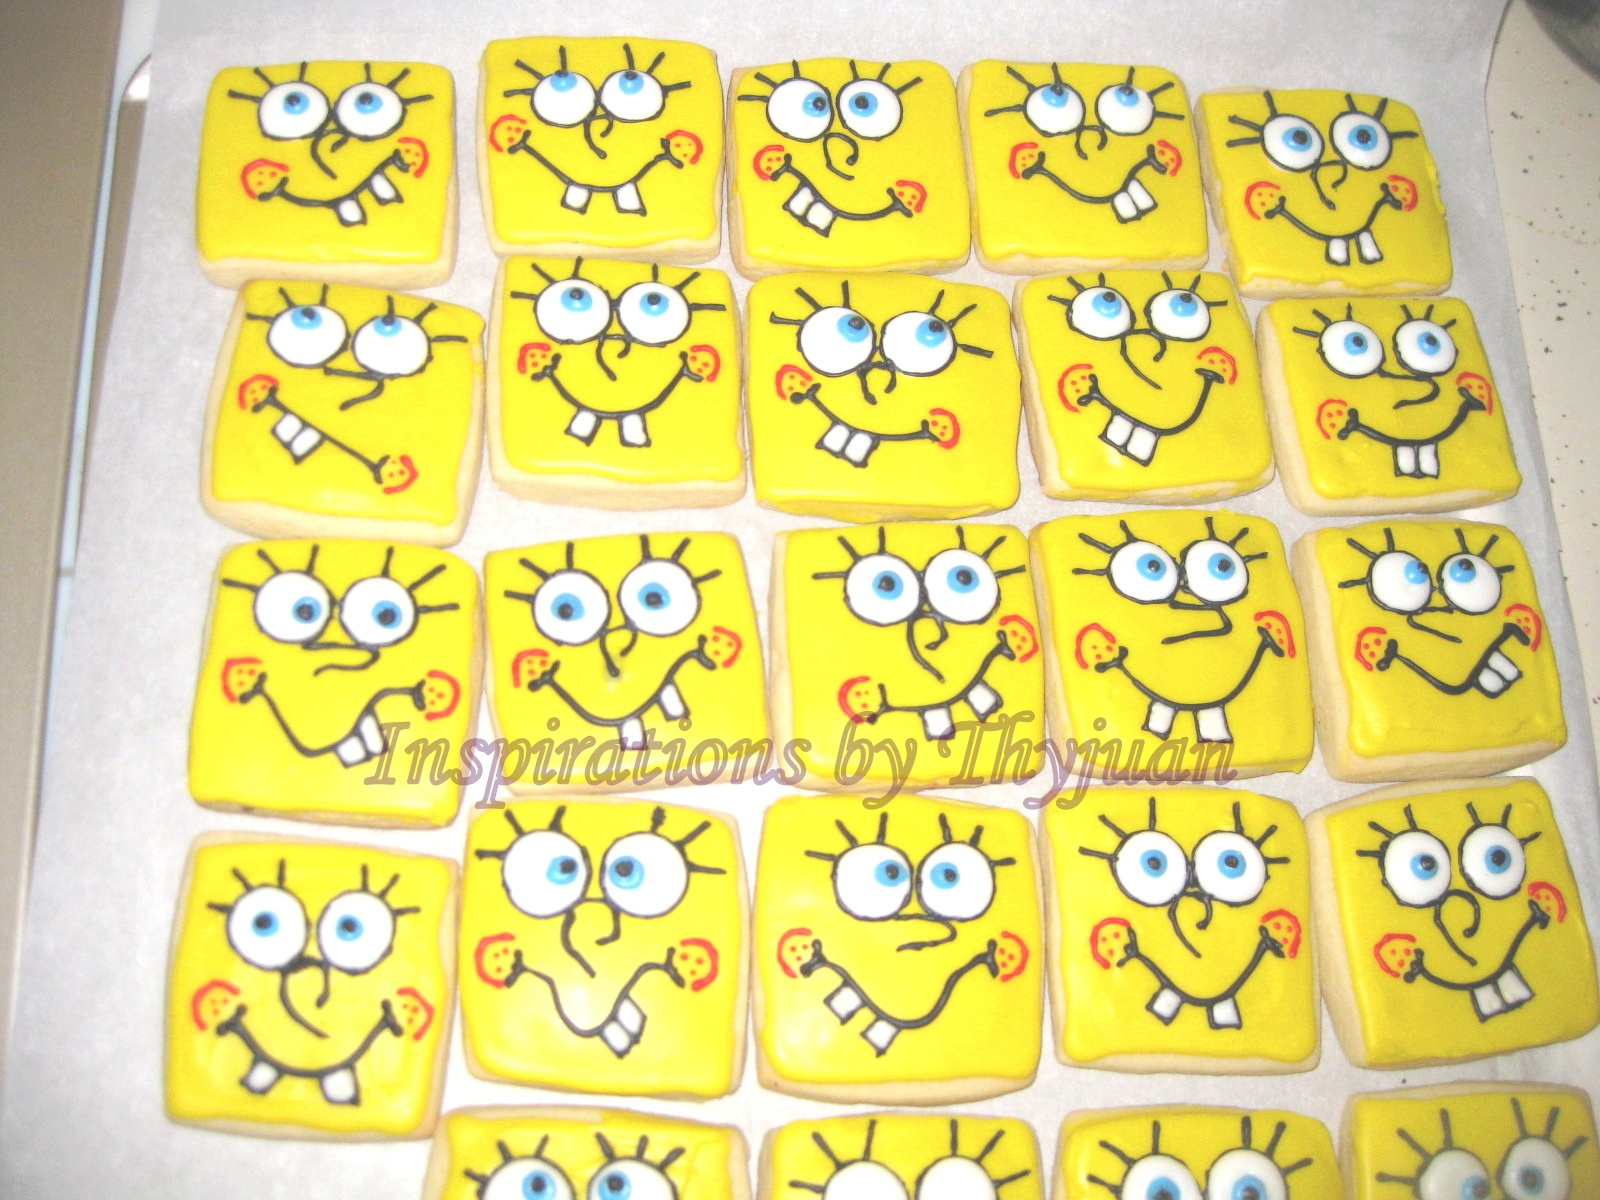 inspirations by thyjuan llc spongebob squarepants cookies